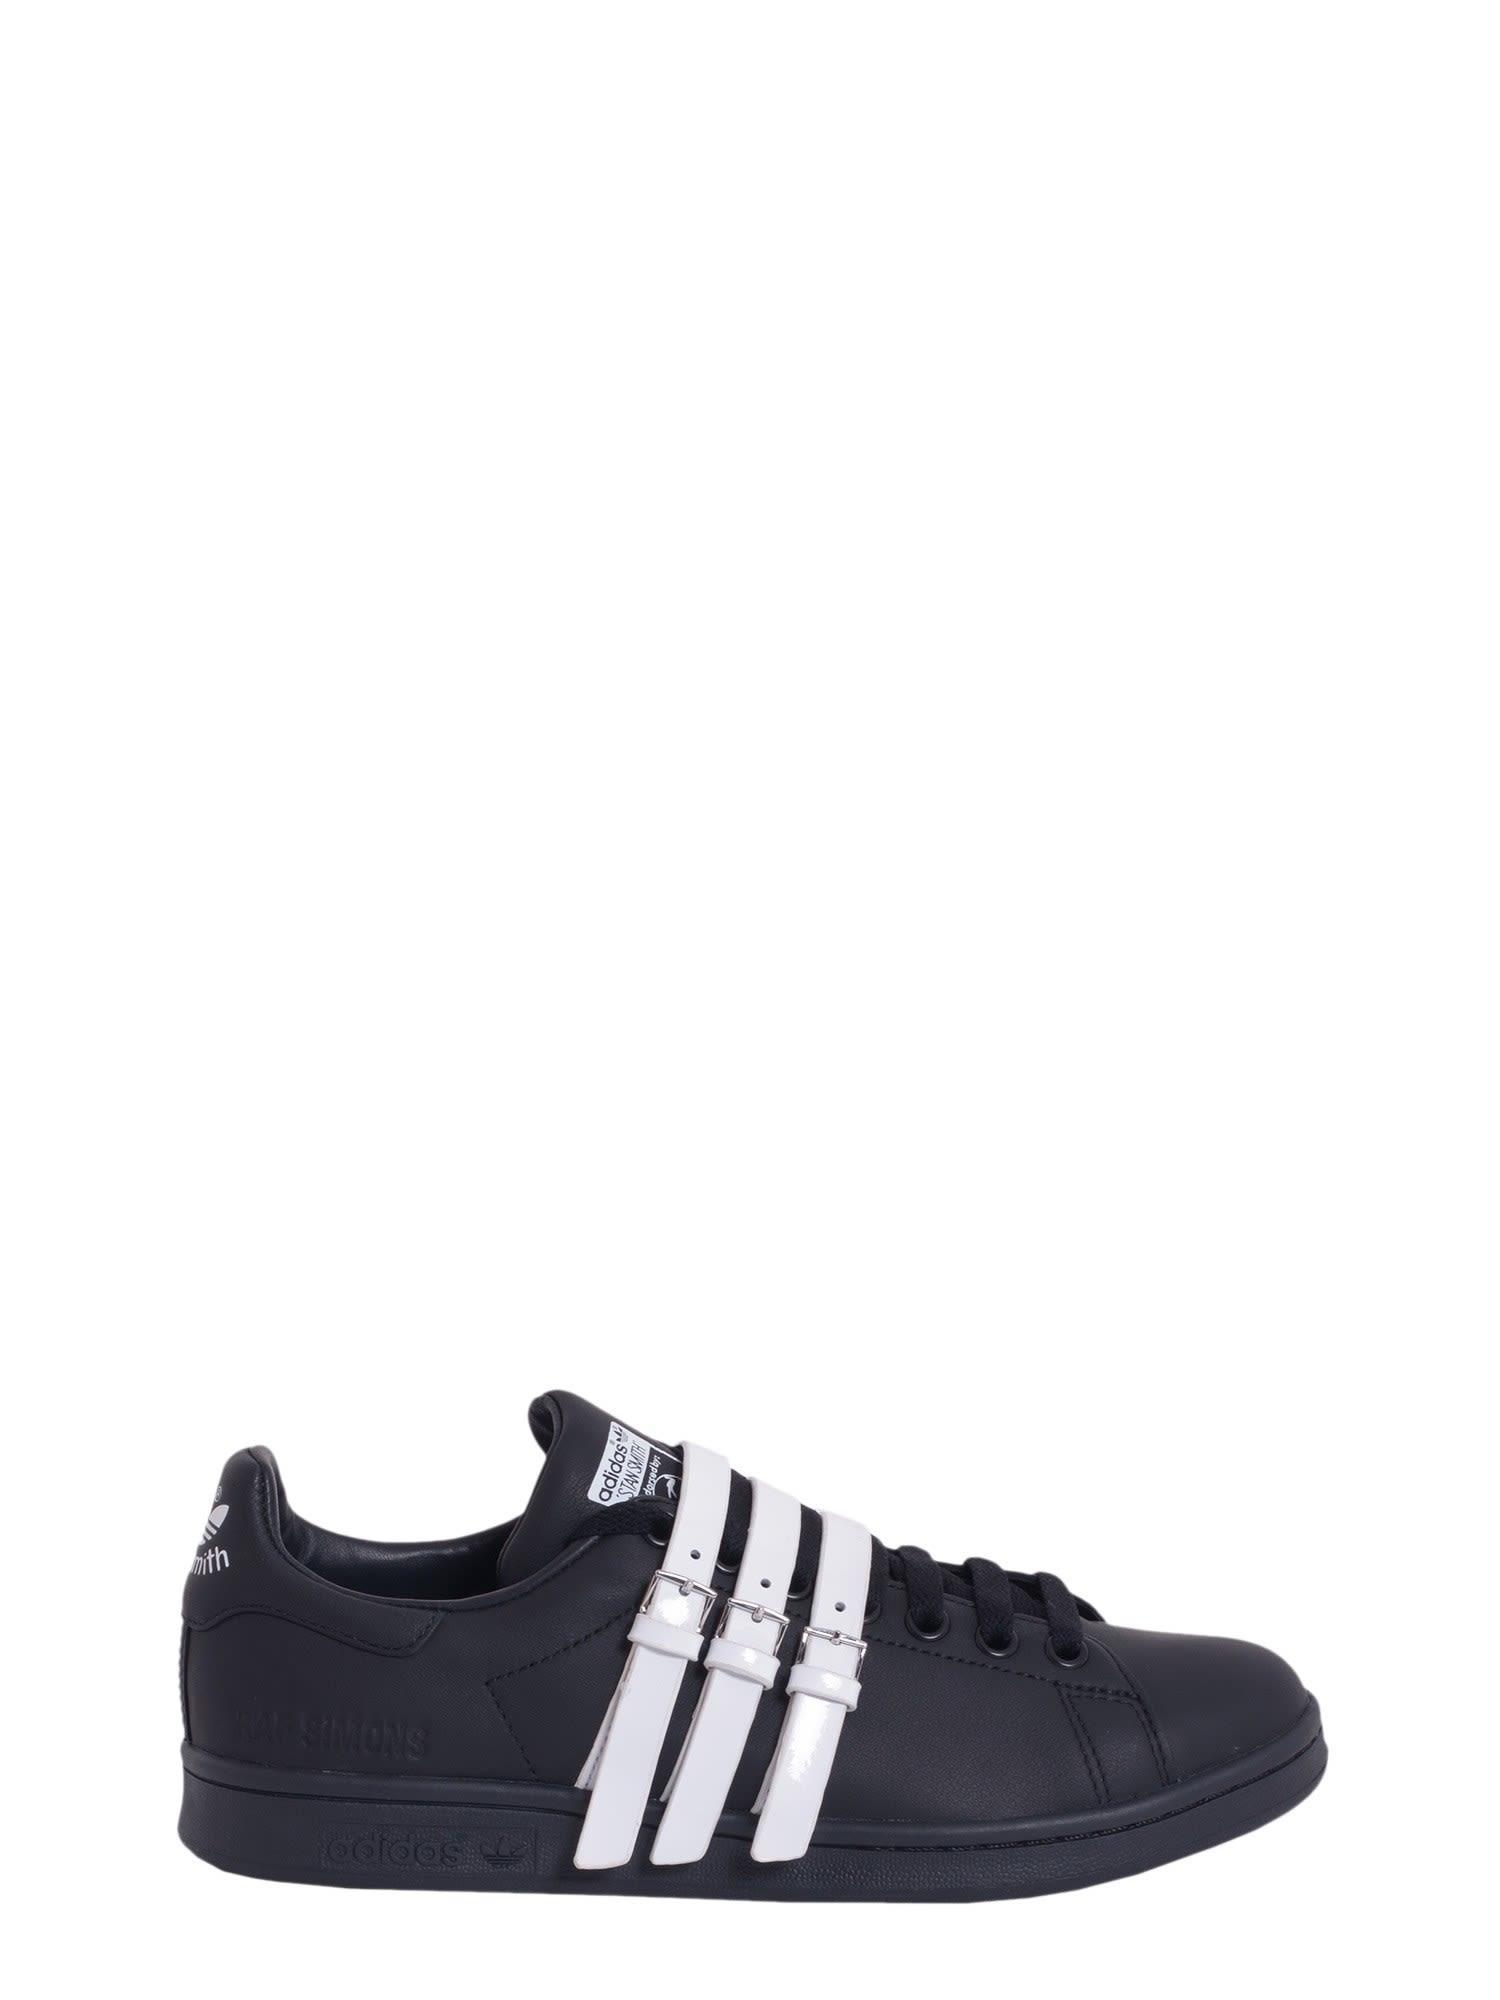 buy adidas stan smith nero